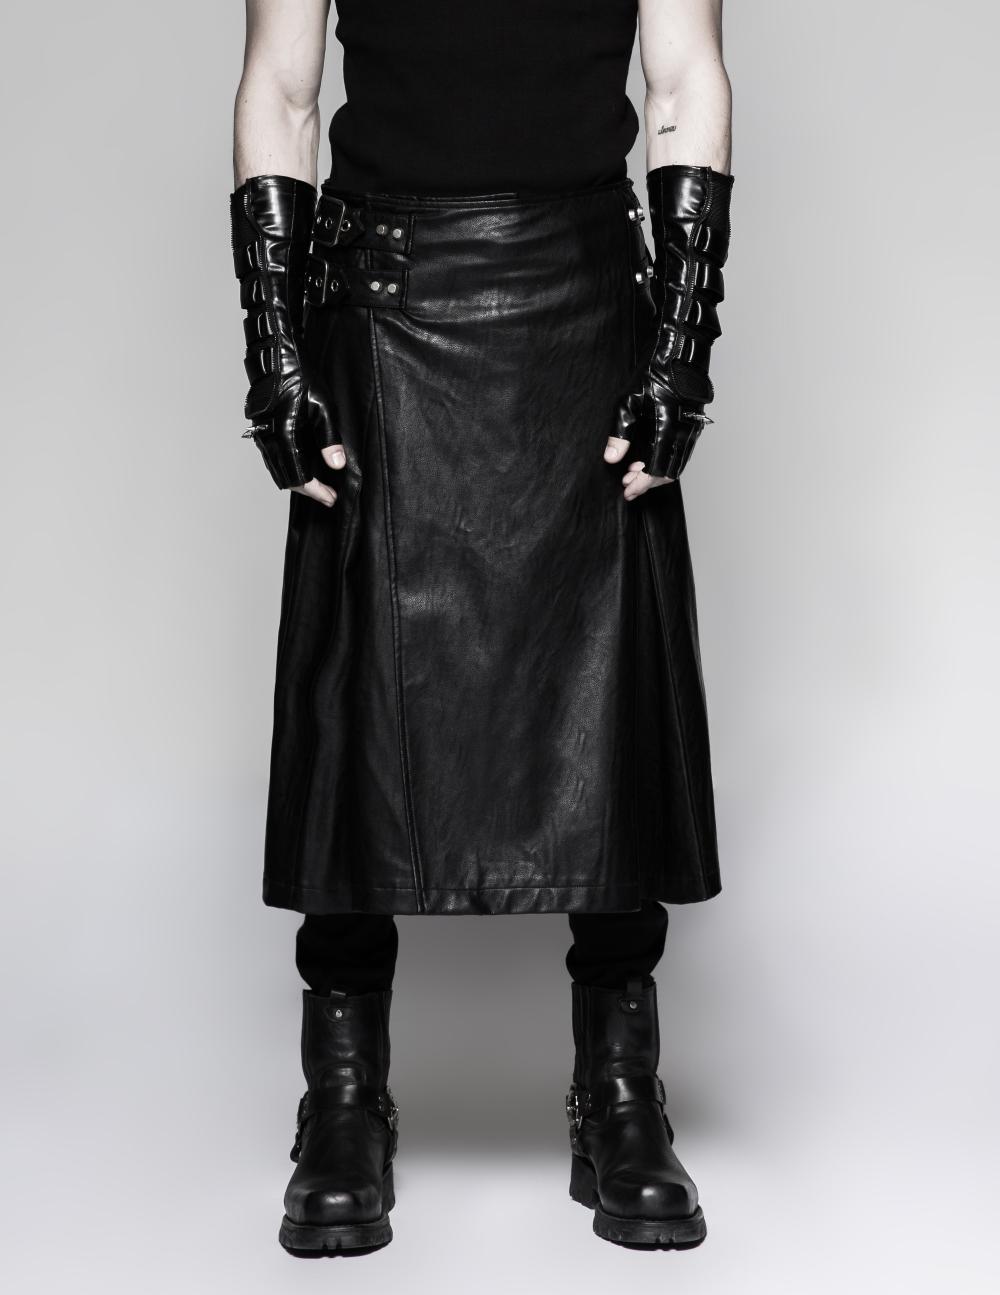 jupe gothique homme en simili cuir noir punk rave. Black Bedroom Furniture Sets. Home Design Ideas